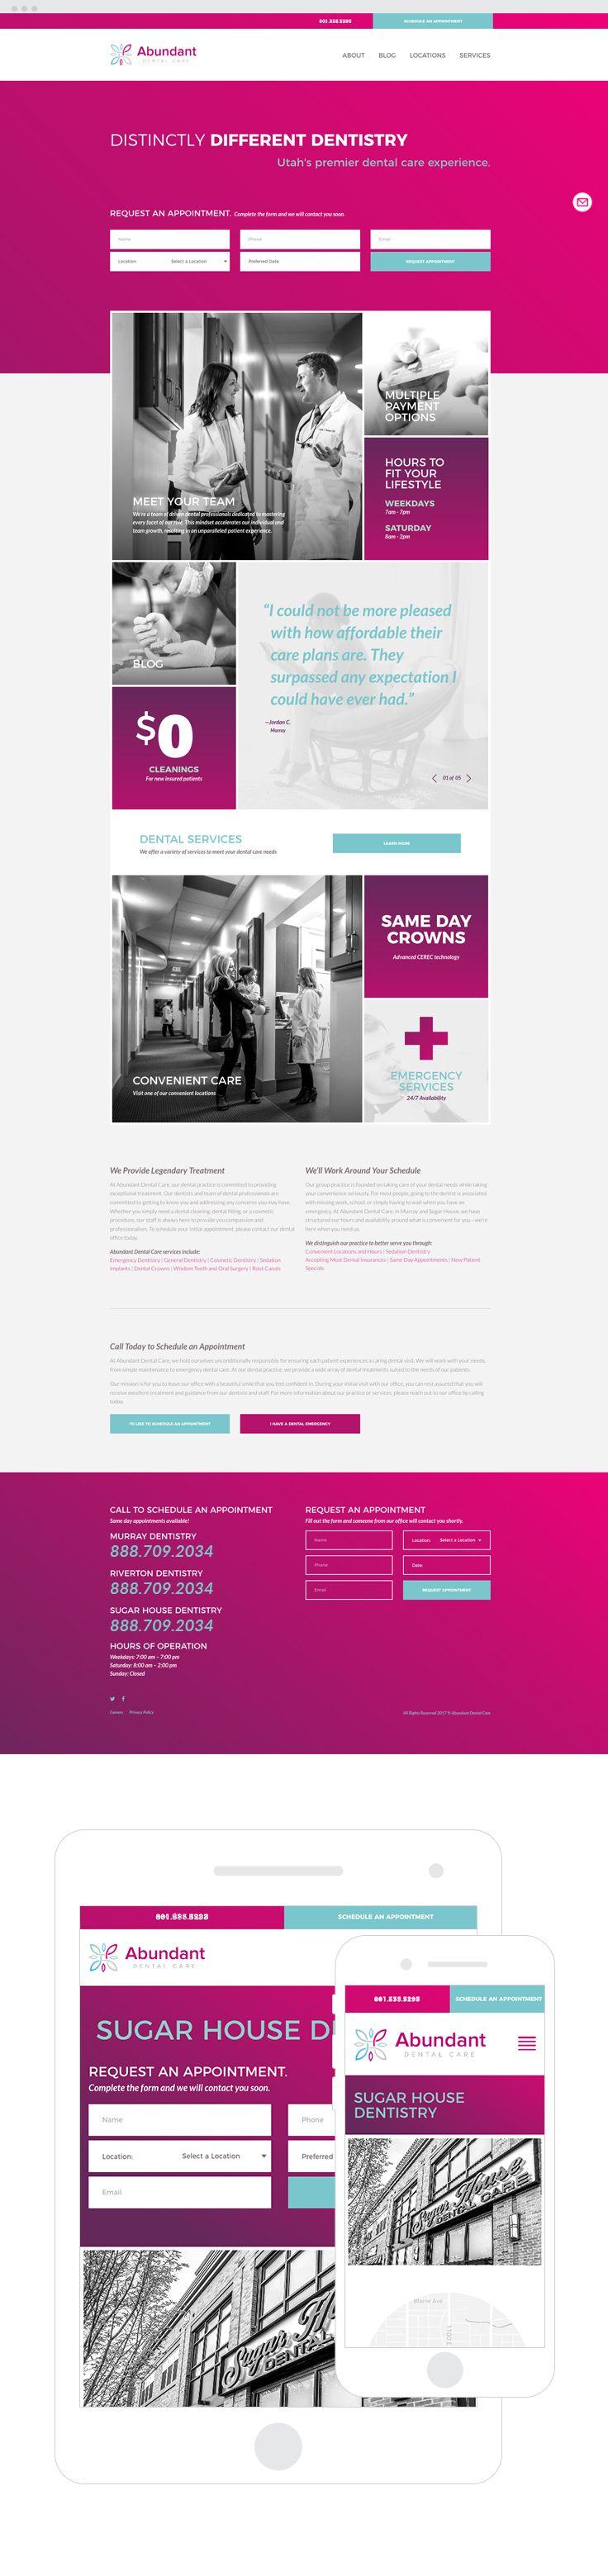 Abundant dental services website by epic marketing